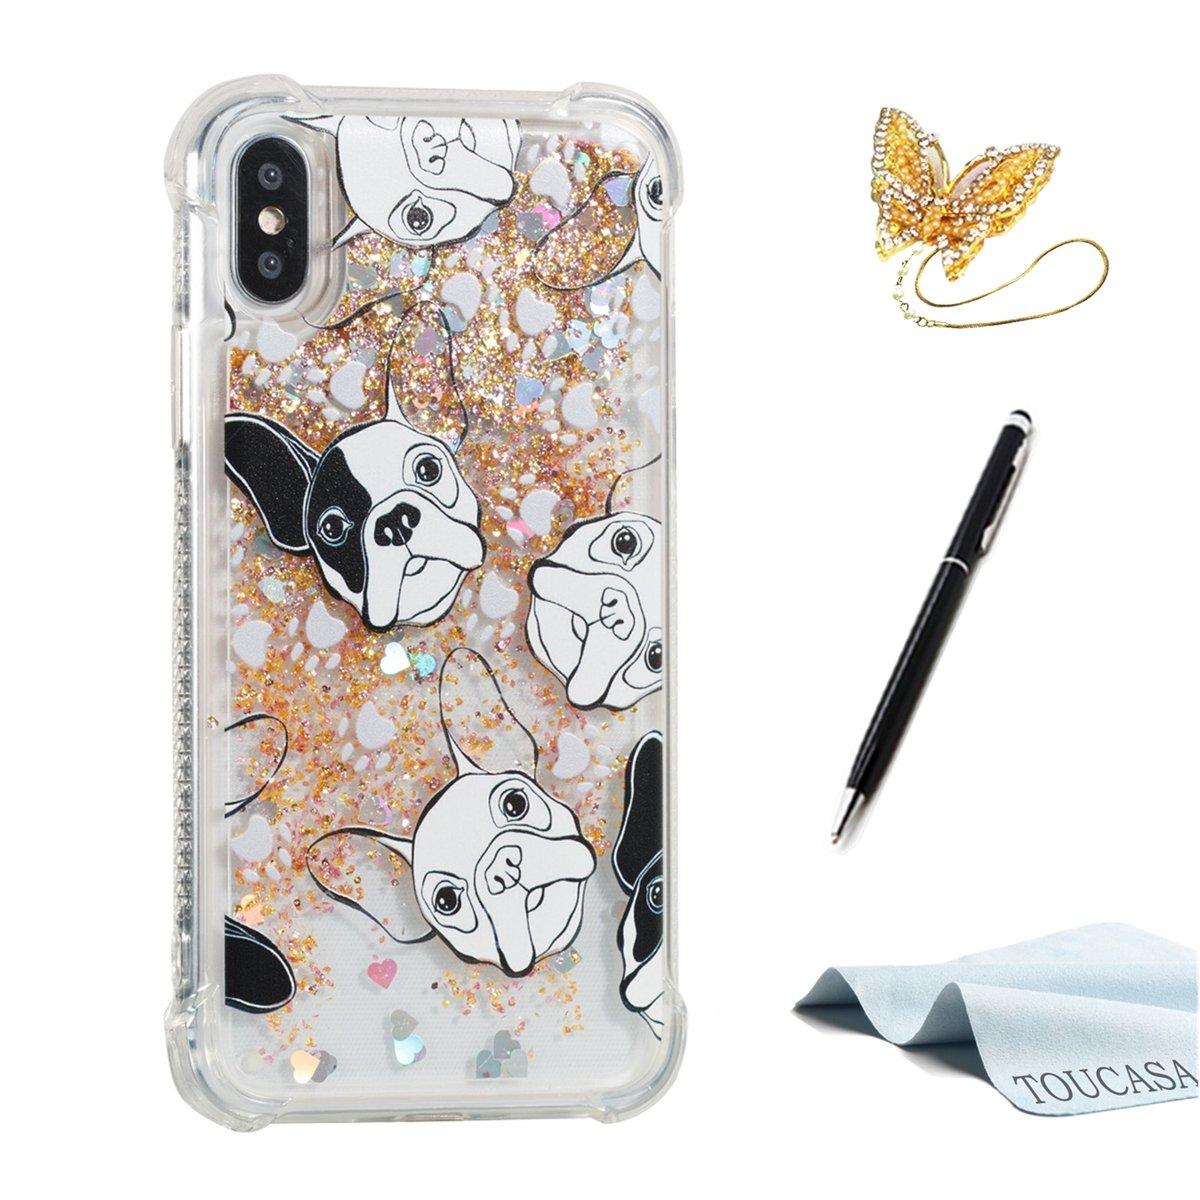 TOUCASA Funda iPhone X, Glitter Brillante Liquida Transparente TPU Silicona,Suave Gel Protectora Carcasa,Funda Móvil Case Líquido Quicksand Anti-arañazos ...